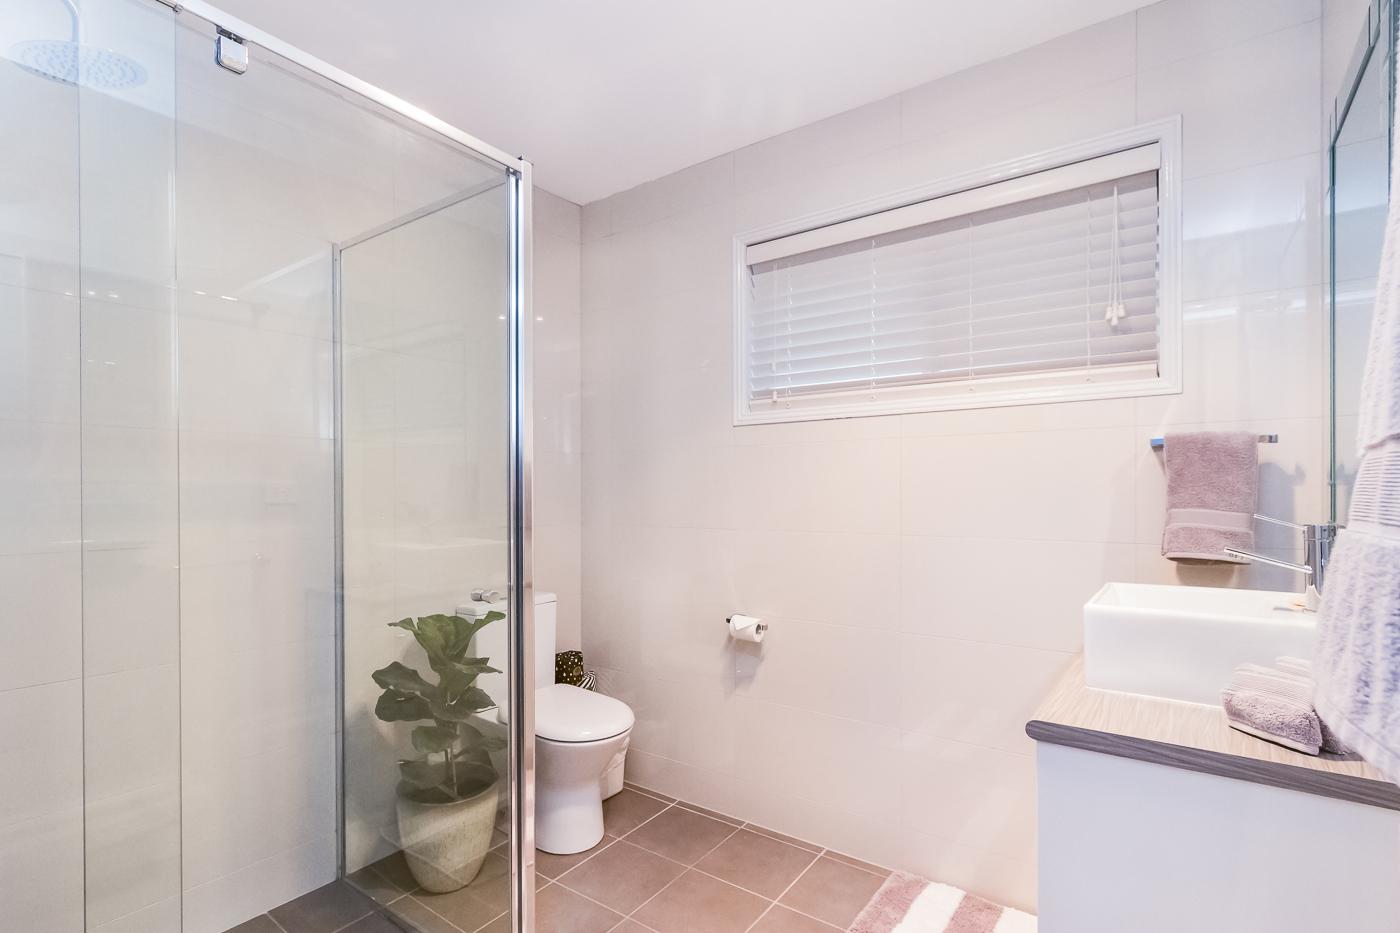 Heated bathroom, luxury towels, local artisan toiletries